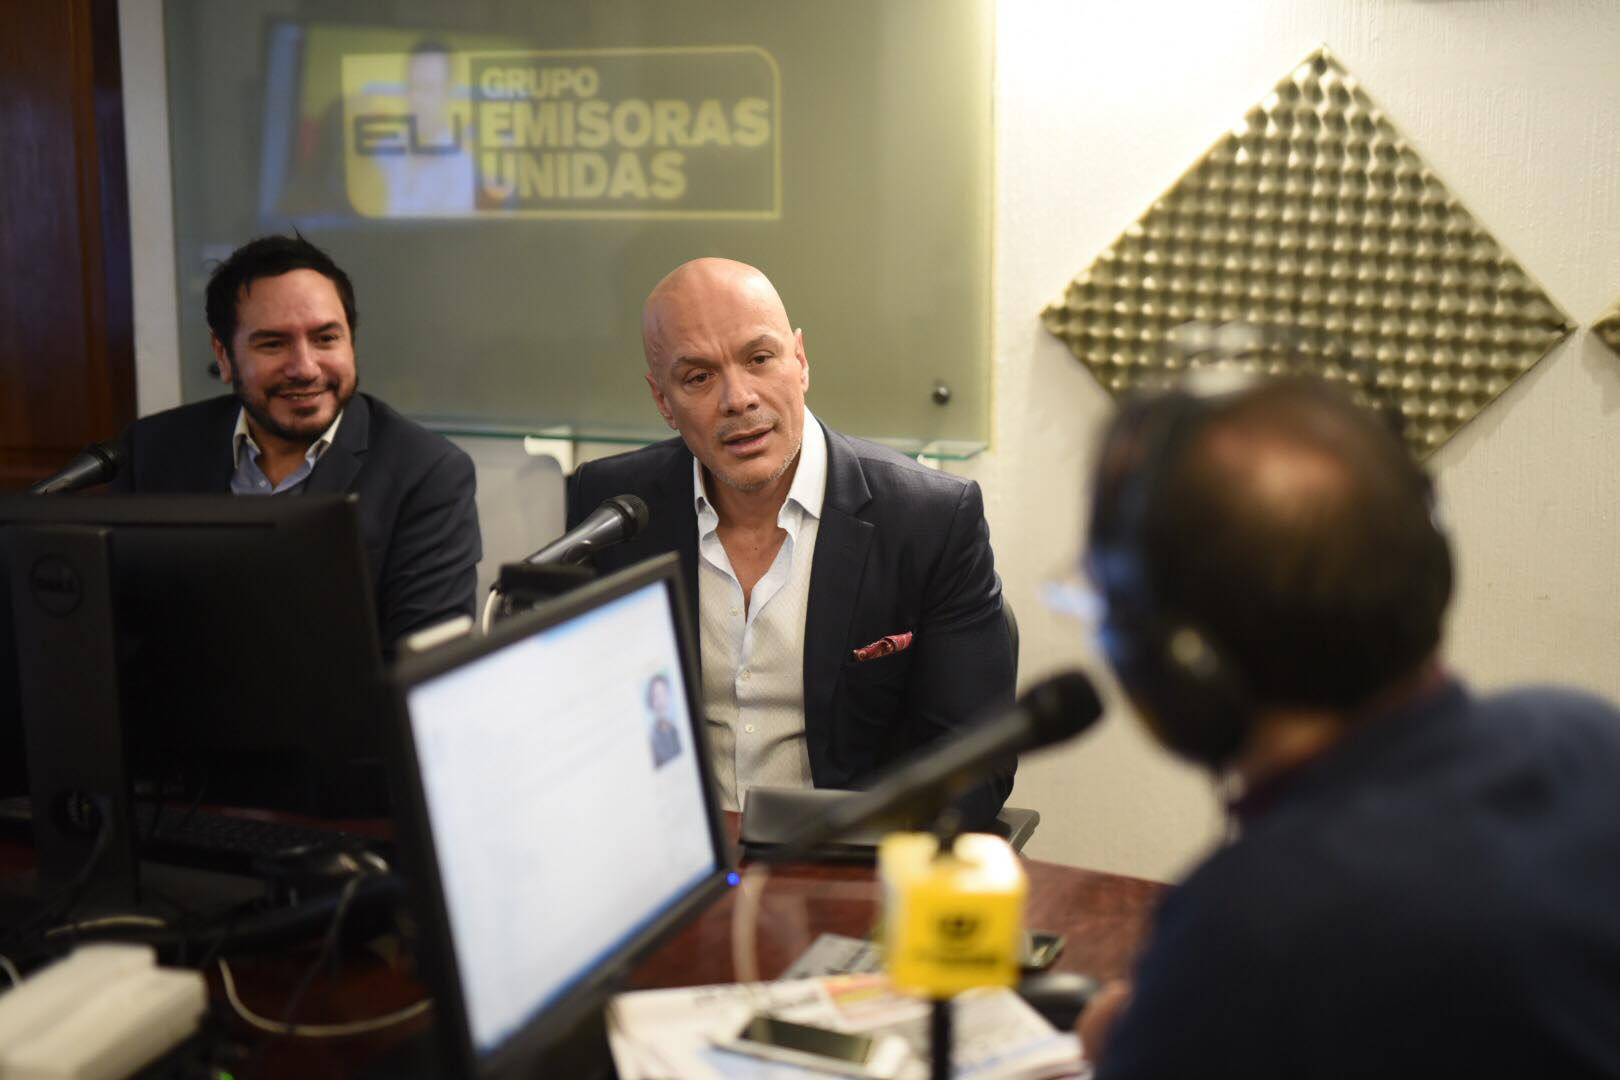 Grupo Emisoras Unidas anuncia alianza comercial con Televisa